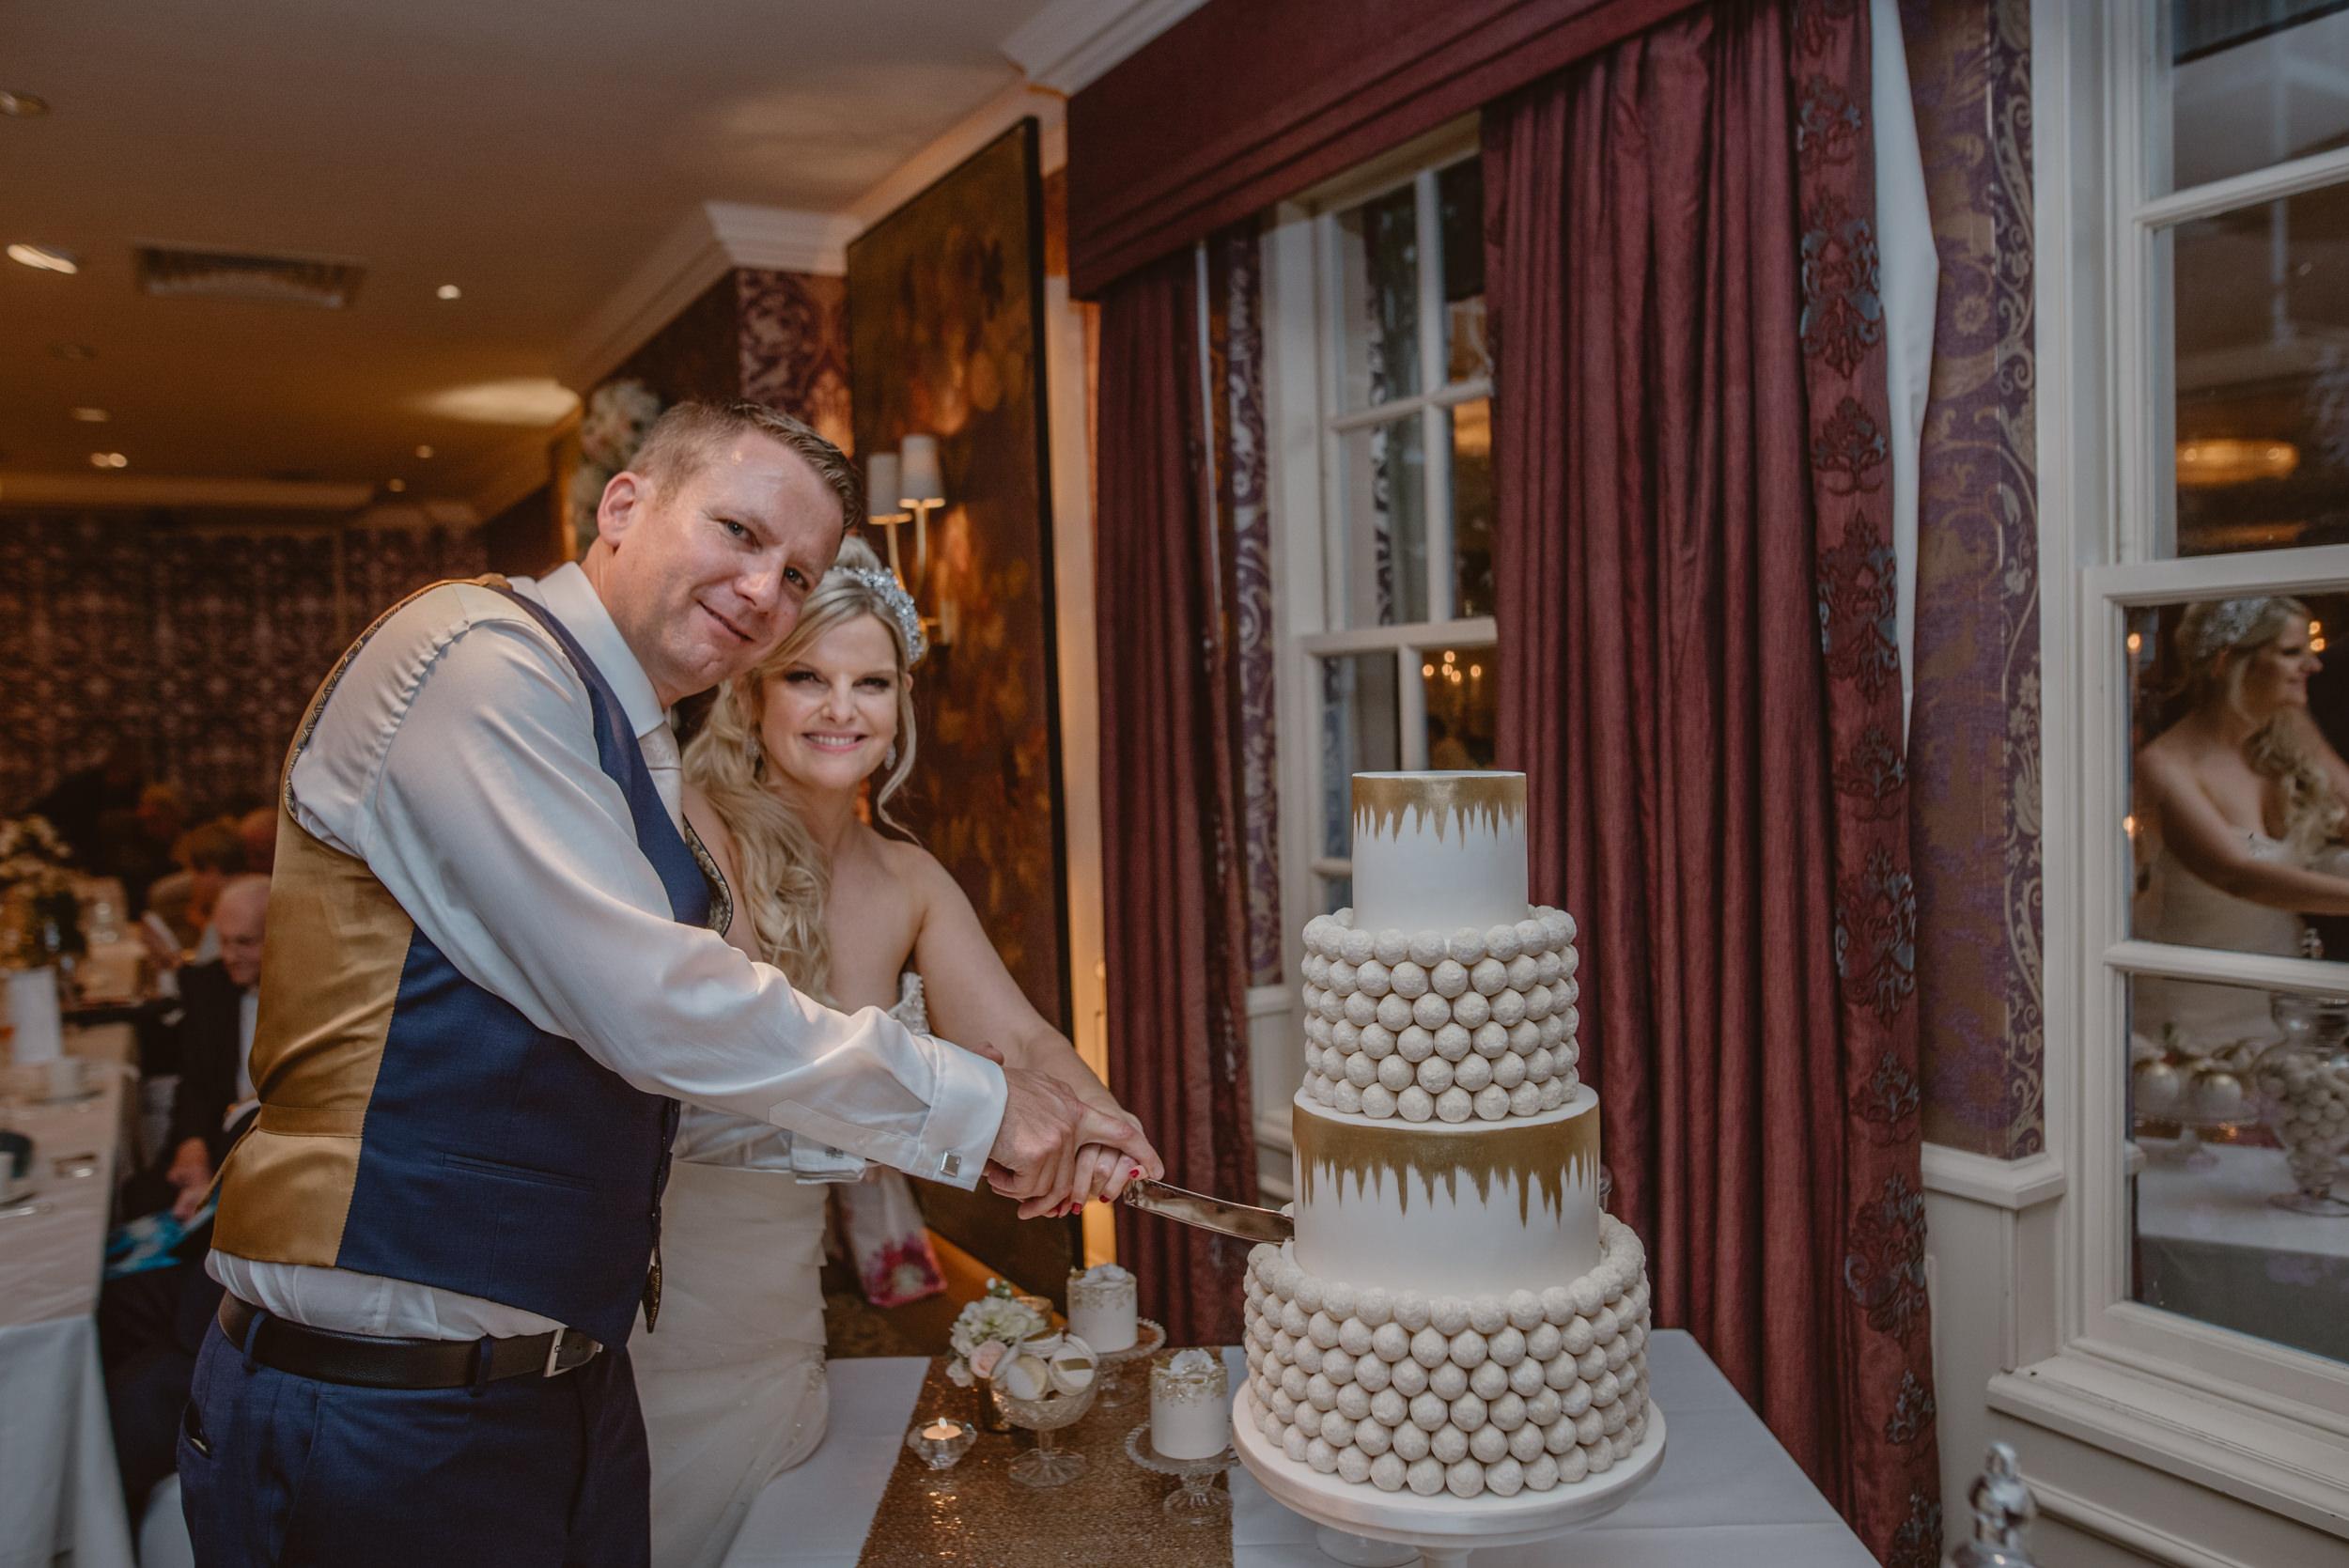 Trisha-and-Roger-wedding-The-Priory-Church-and-Chewton-Glen-Hotel-Christchurch-Manu-Mendoza-Wedding-Photography-476.jpg